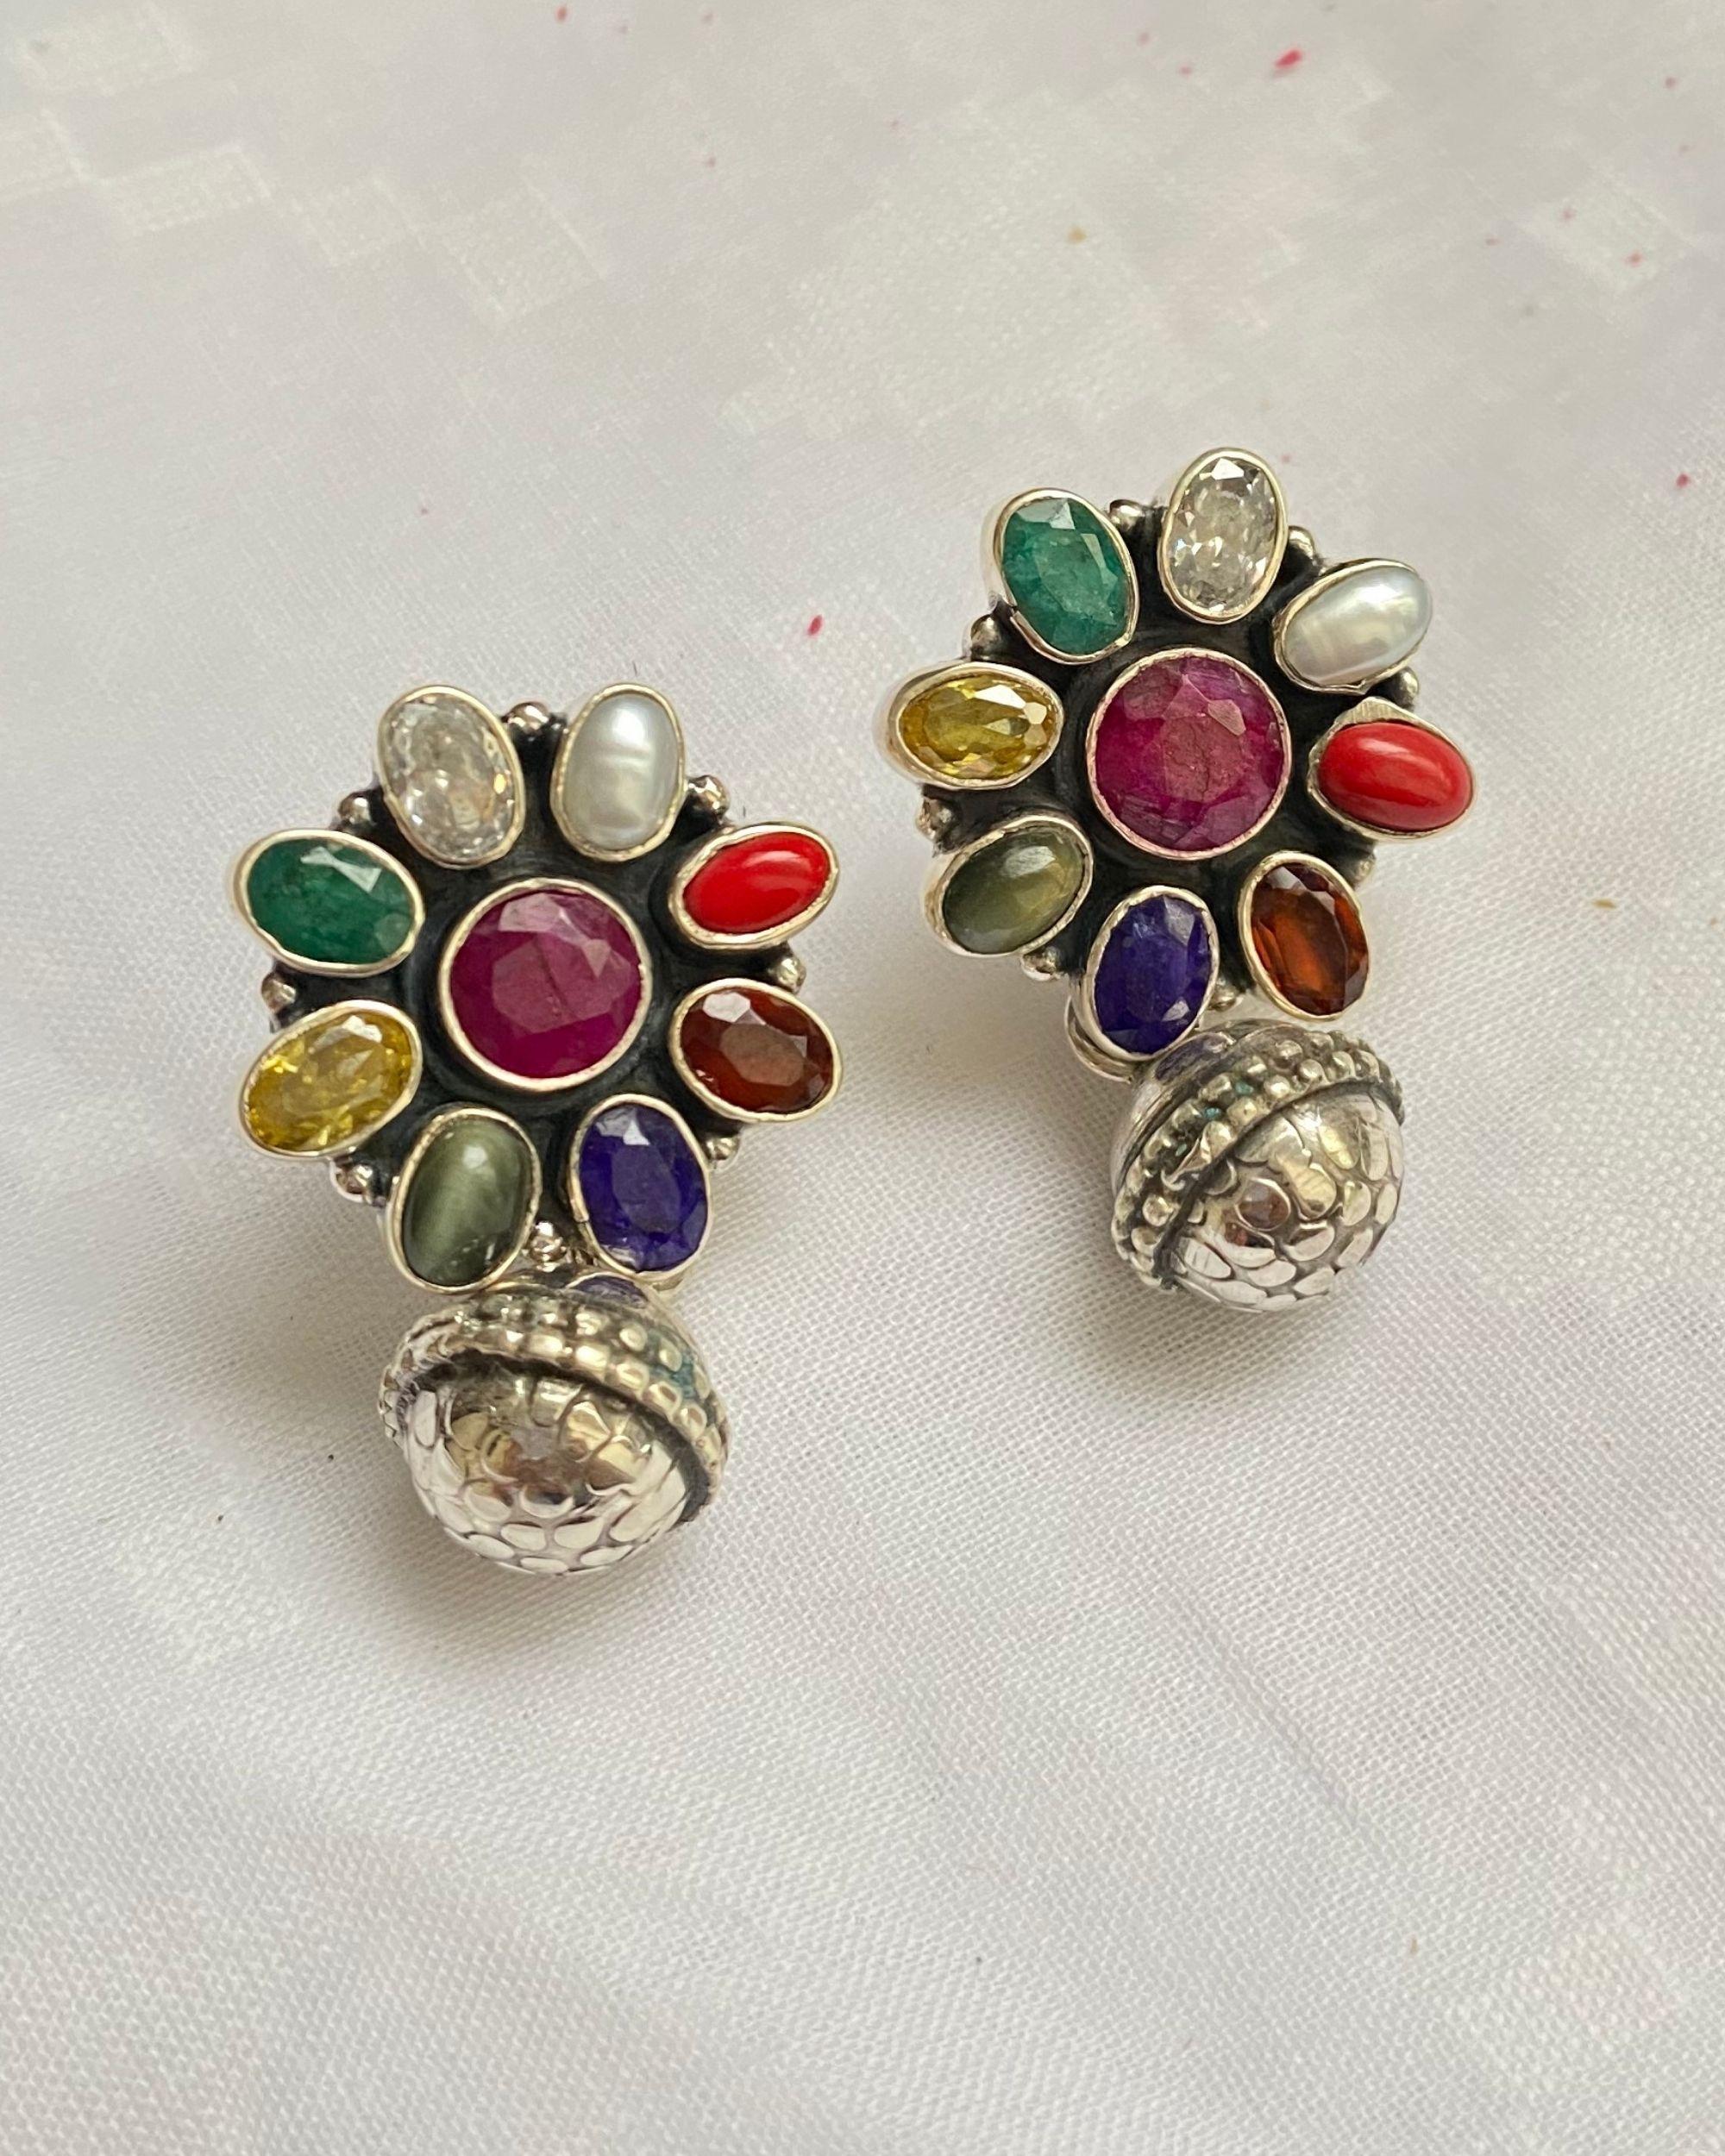 Navratna floral earrings